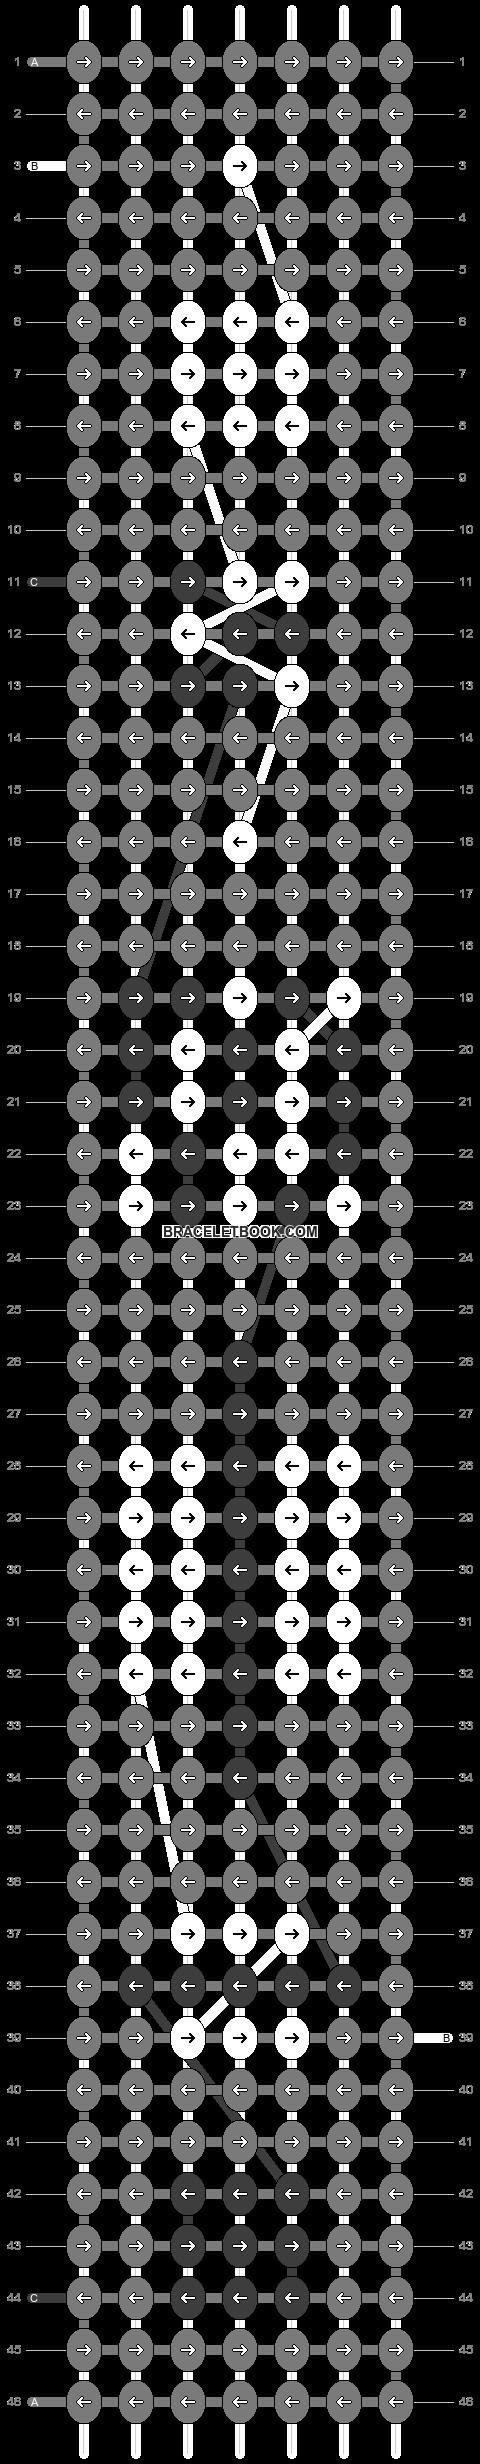 Alpha pattern #66741 pattern